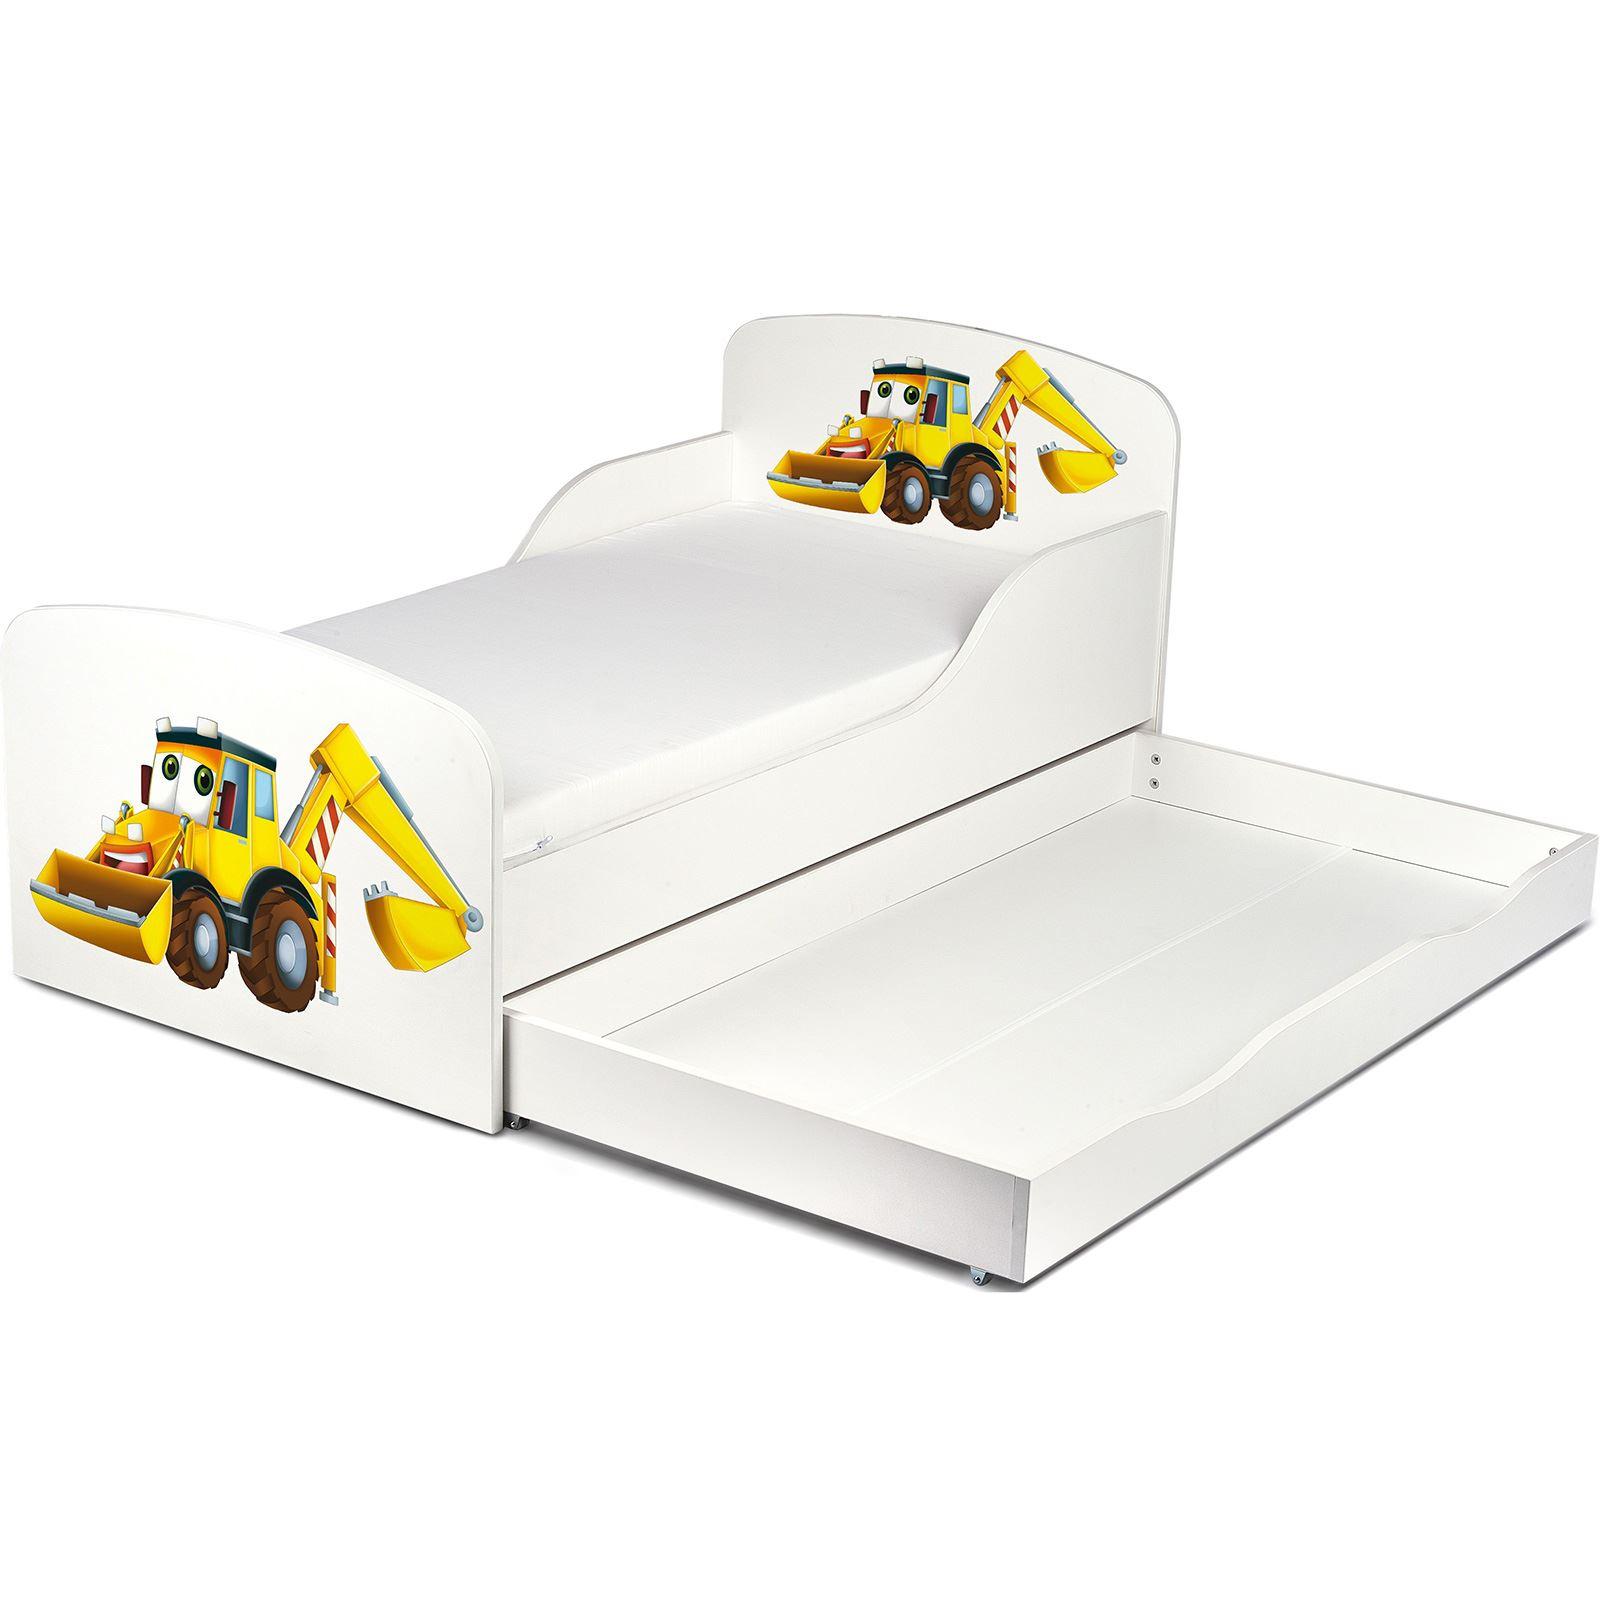 Price-Right-Home-Excavadoras-Cama-Infantil-con-o-Sin-Almacenaje-Colchon miniatura 16